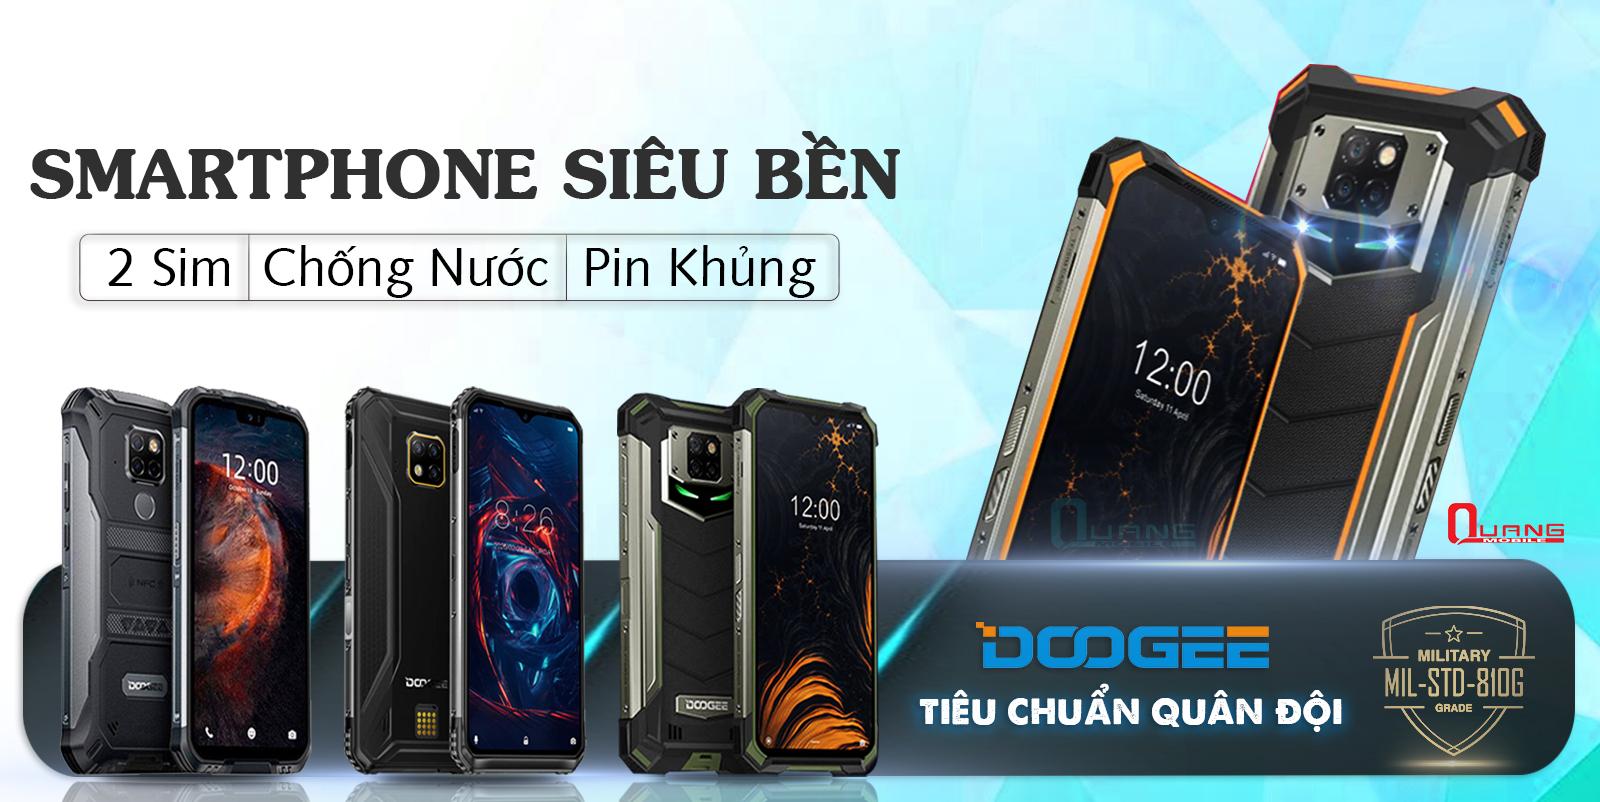 http://www.quangmobile.vn/admin/http://www.quangmobile.vn/c-doogee-pin-khung-2-sim